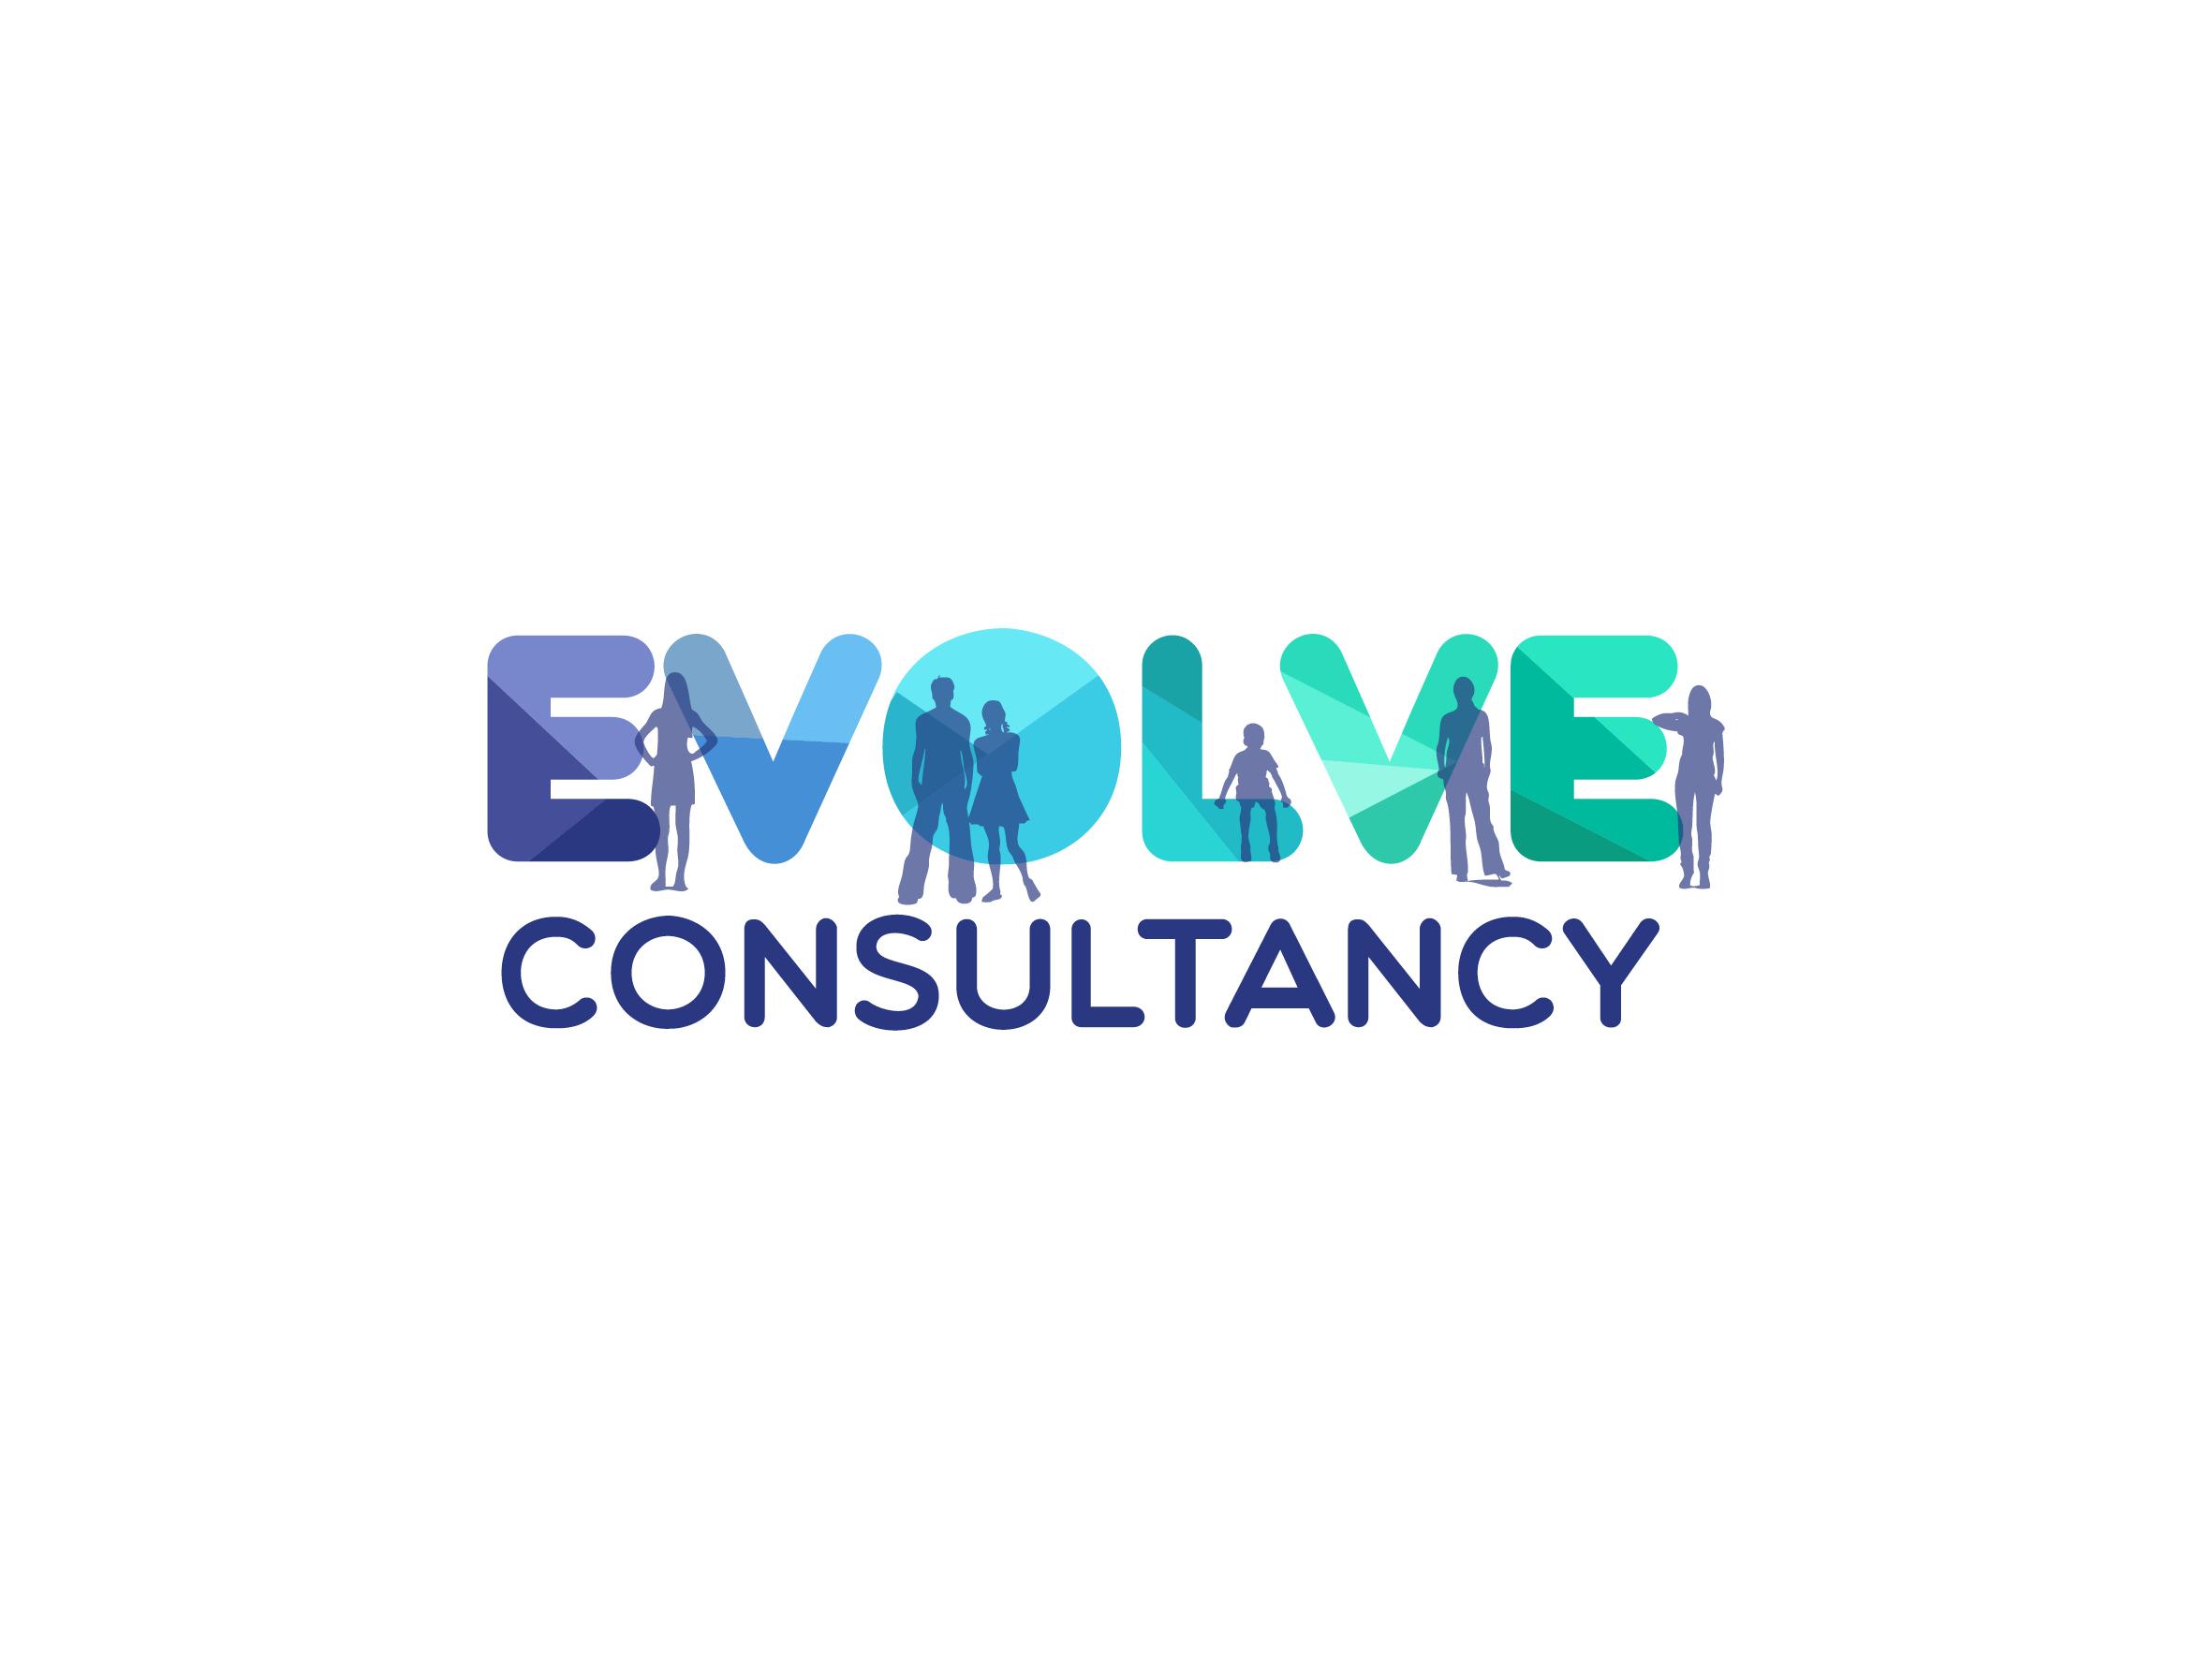 evolve consultancy logo design designed by Dakini Design Saltaire, Shipley, Bradford